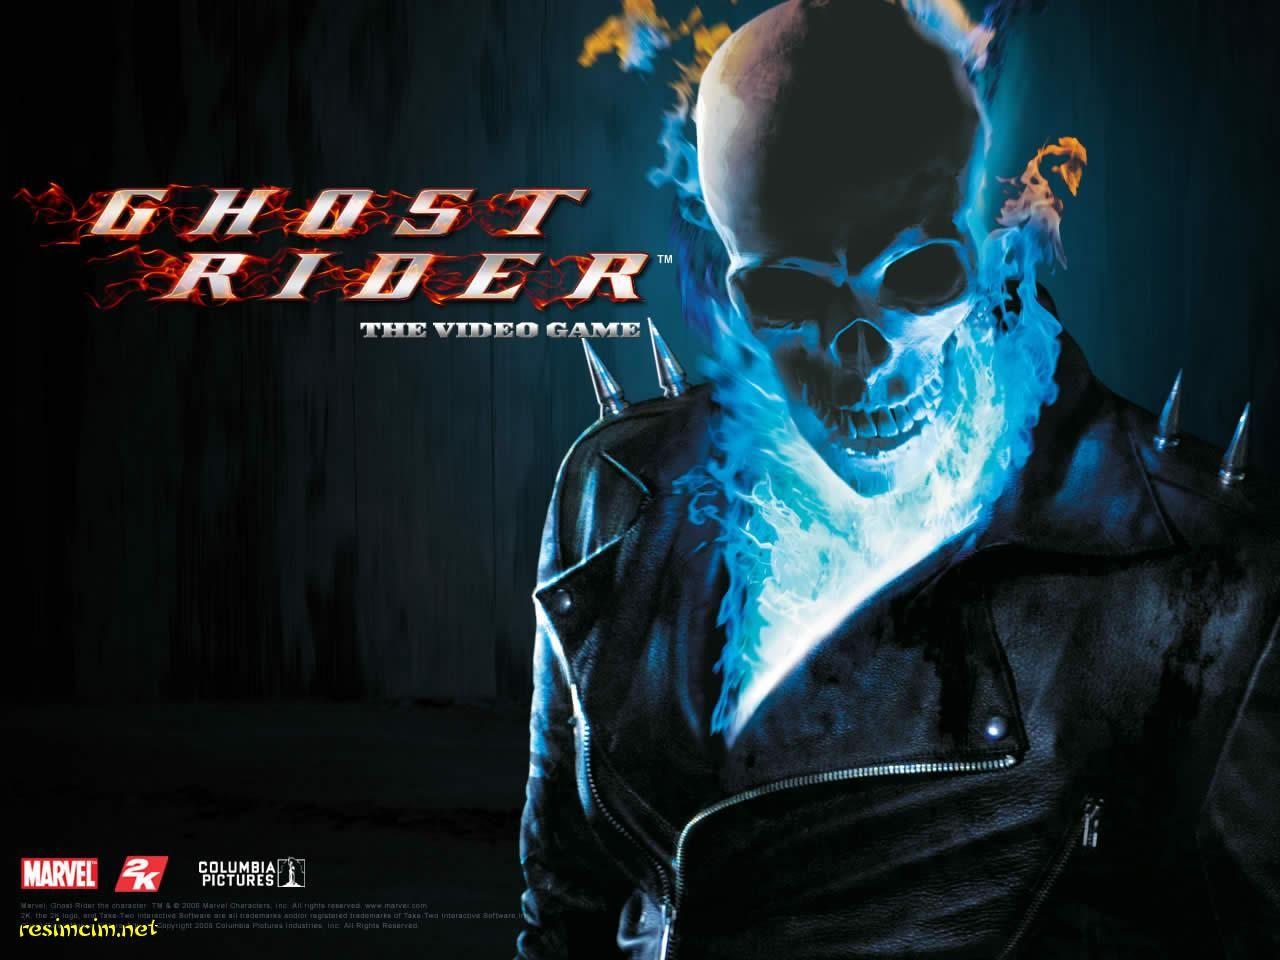 Ghost Rider Spirit Of Vengeance Hd Desktop Wallpaper High 1920 1080 Ghost Pictures Wallpapers 53 Wallpape Ghost Rider Ghost Rider Wallpaper Blue Ghost Rider Ghost rider spirit of vengeance game